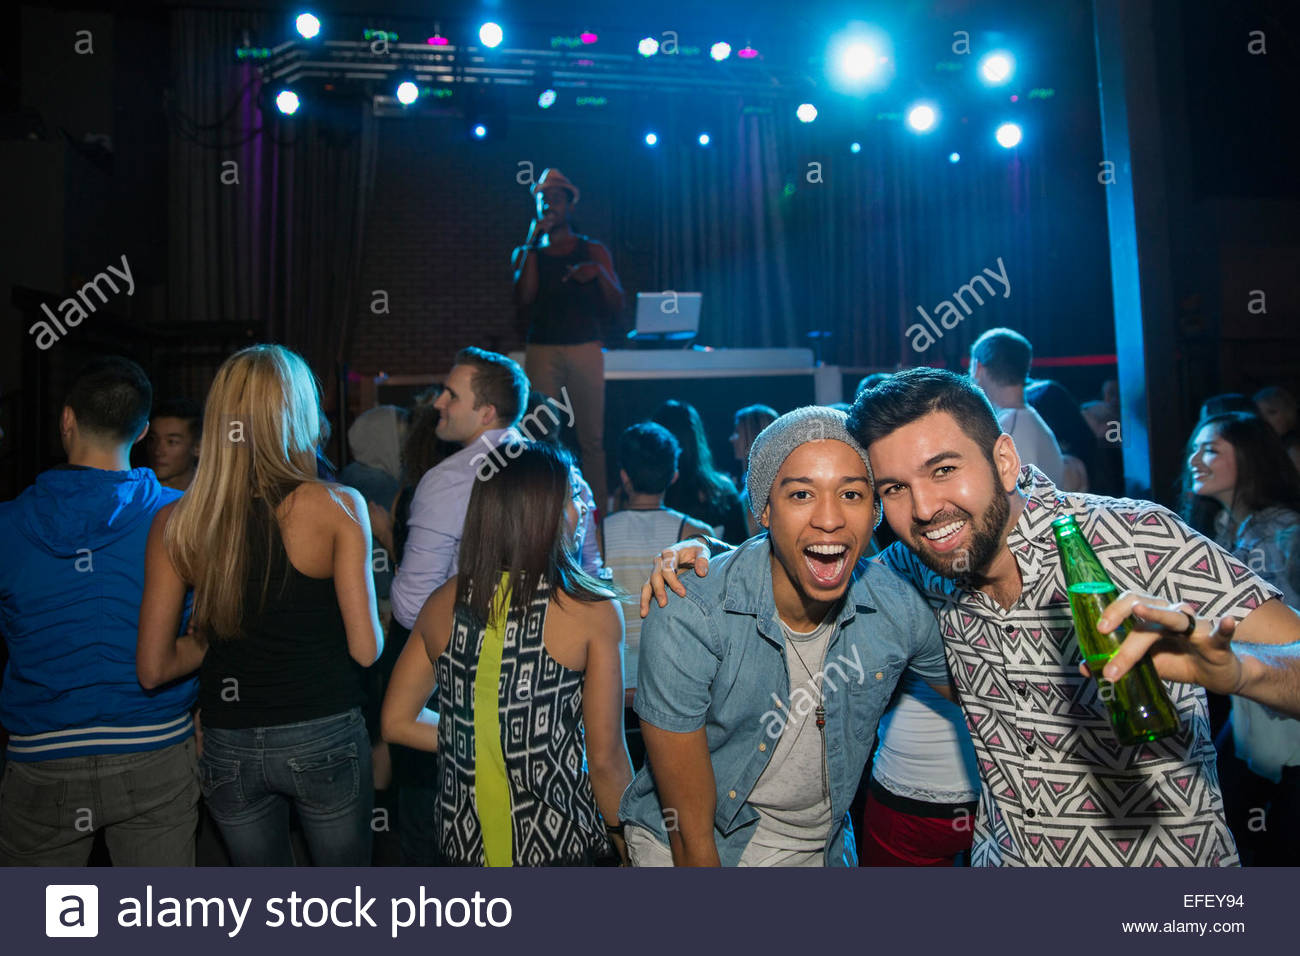 Portrait of smiling men at nightclub Banque D'Images